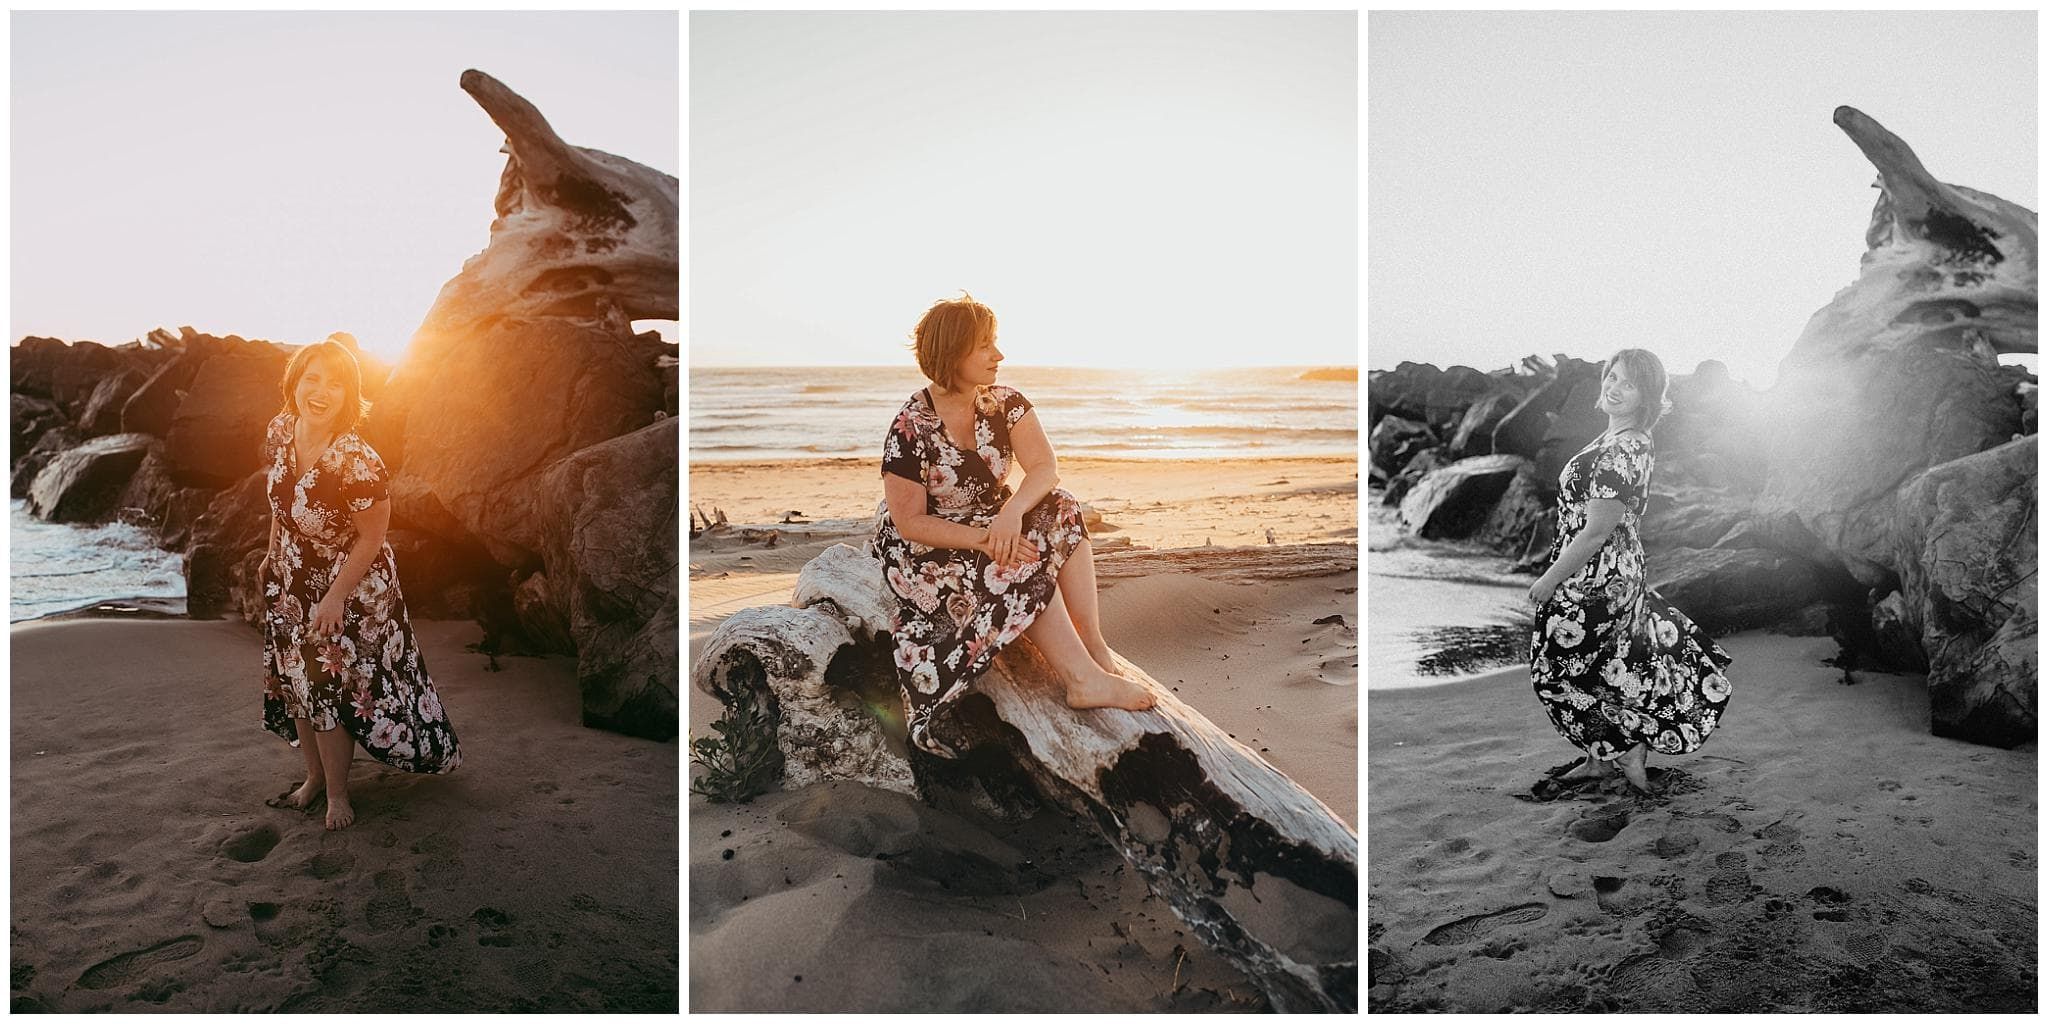 Woman sitting on driftwood at the oregon coast